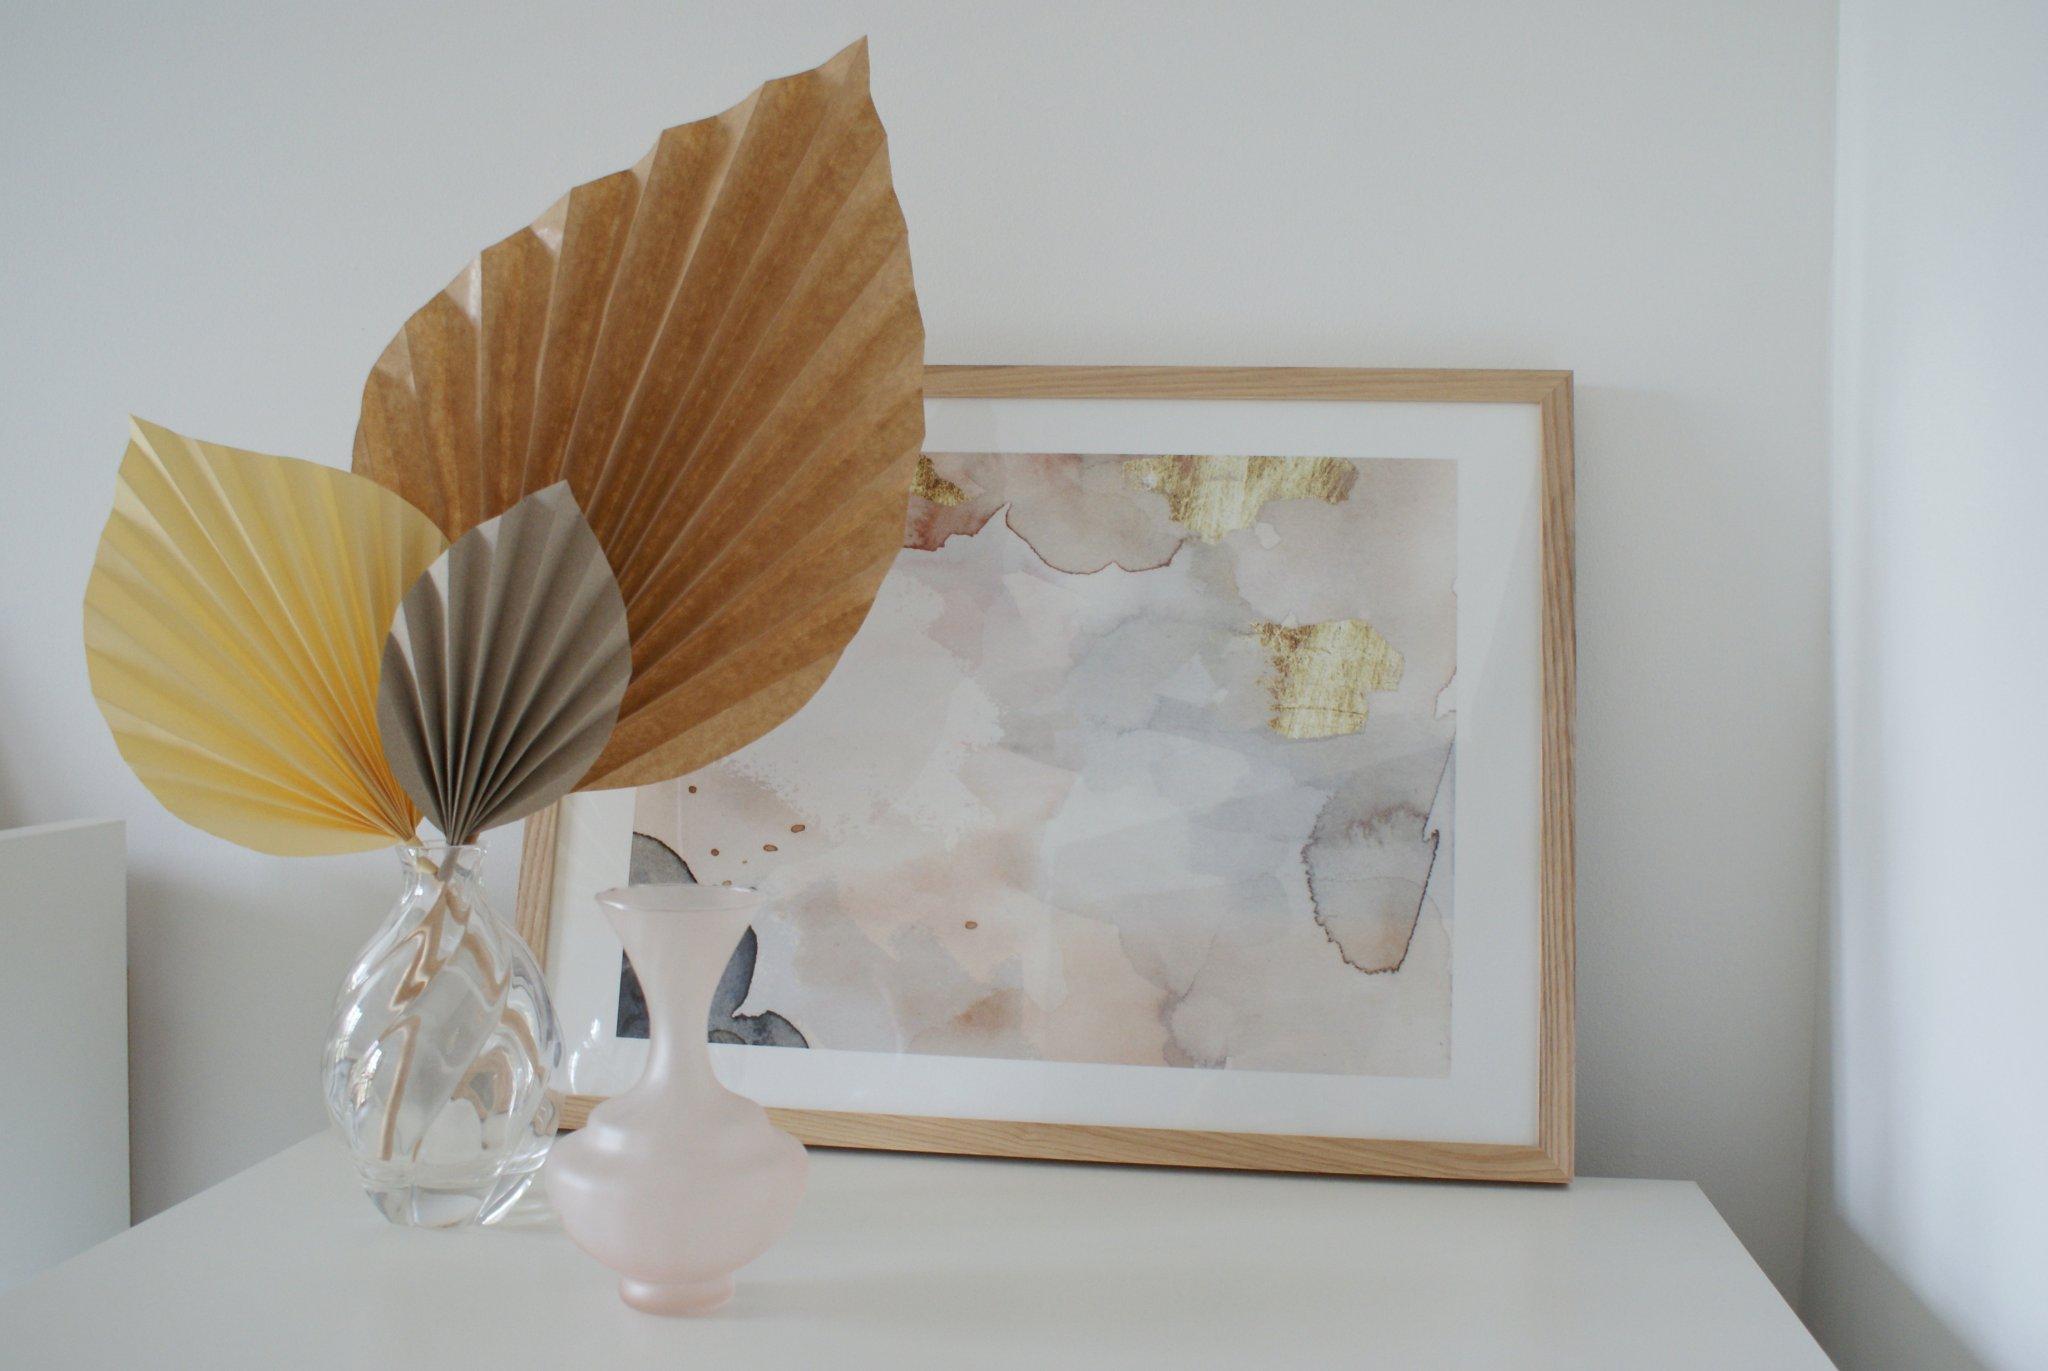 diy palm paper leaf leaves decor idea handmade craft easy simple tutorial home decoration neutral minimalist francinesplaceblog 3